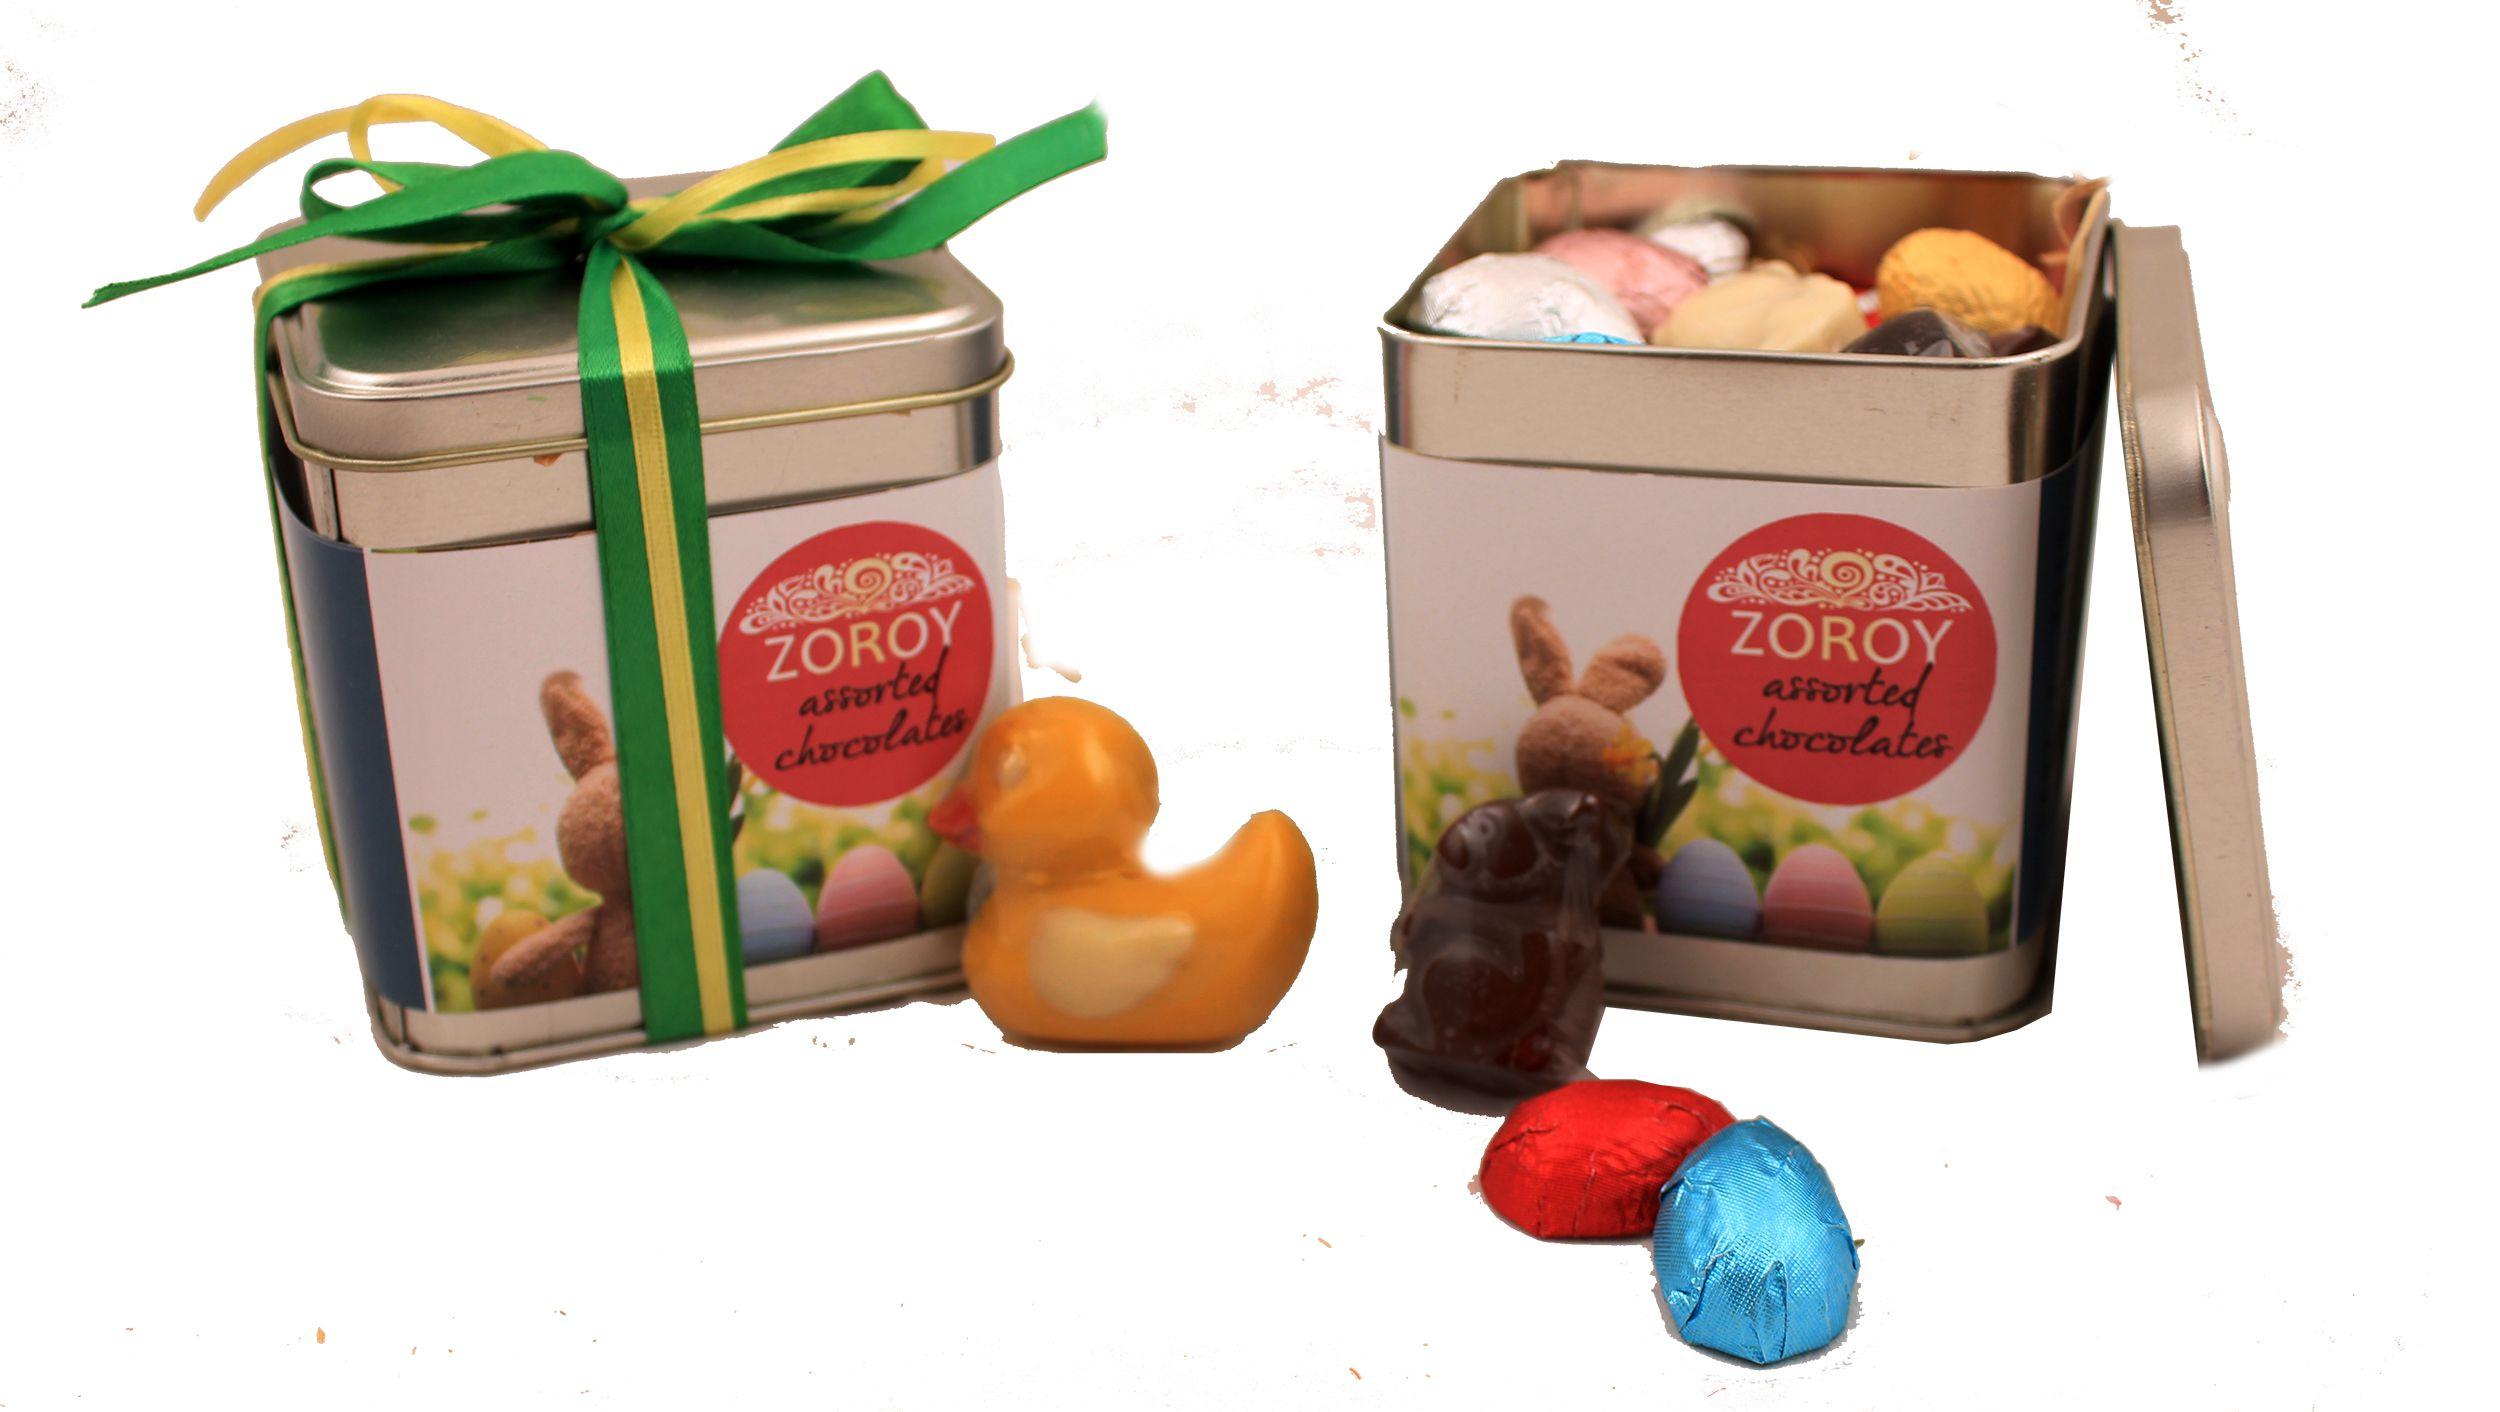 Zoroy Luxury Chocolate Chocolate Tin Easter Chocolate Gift 500 gm